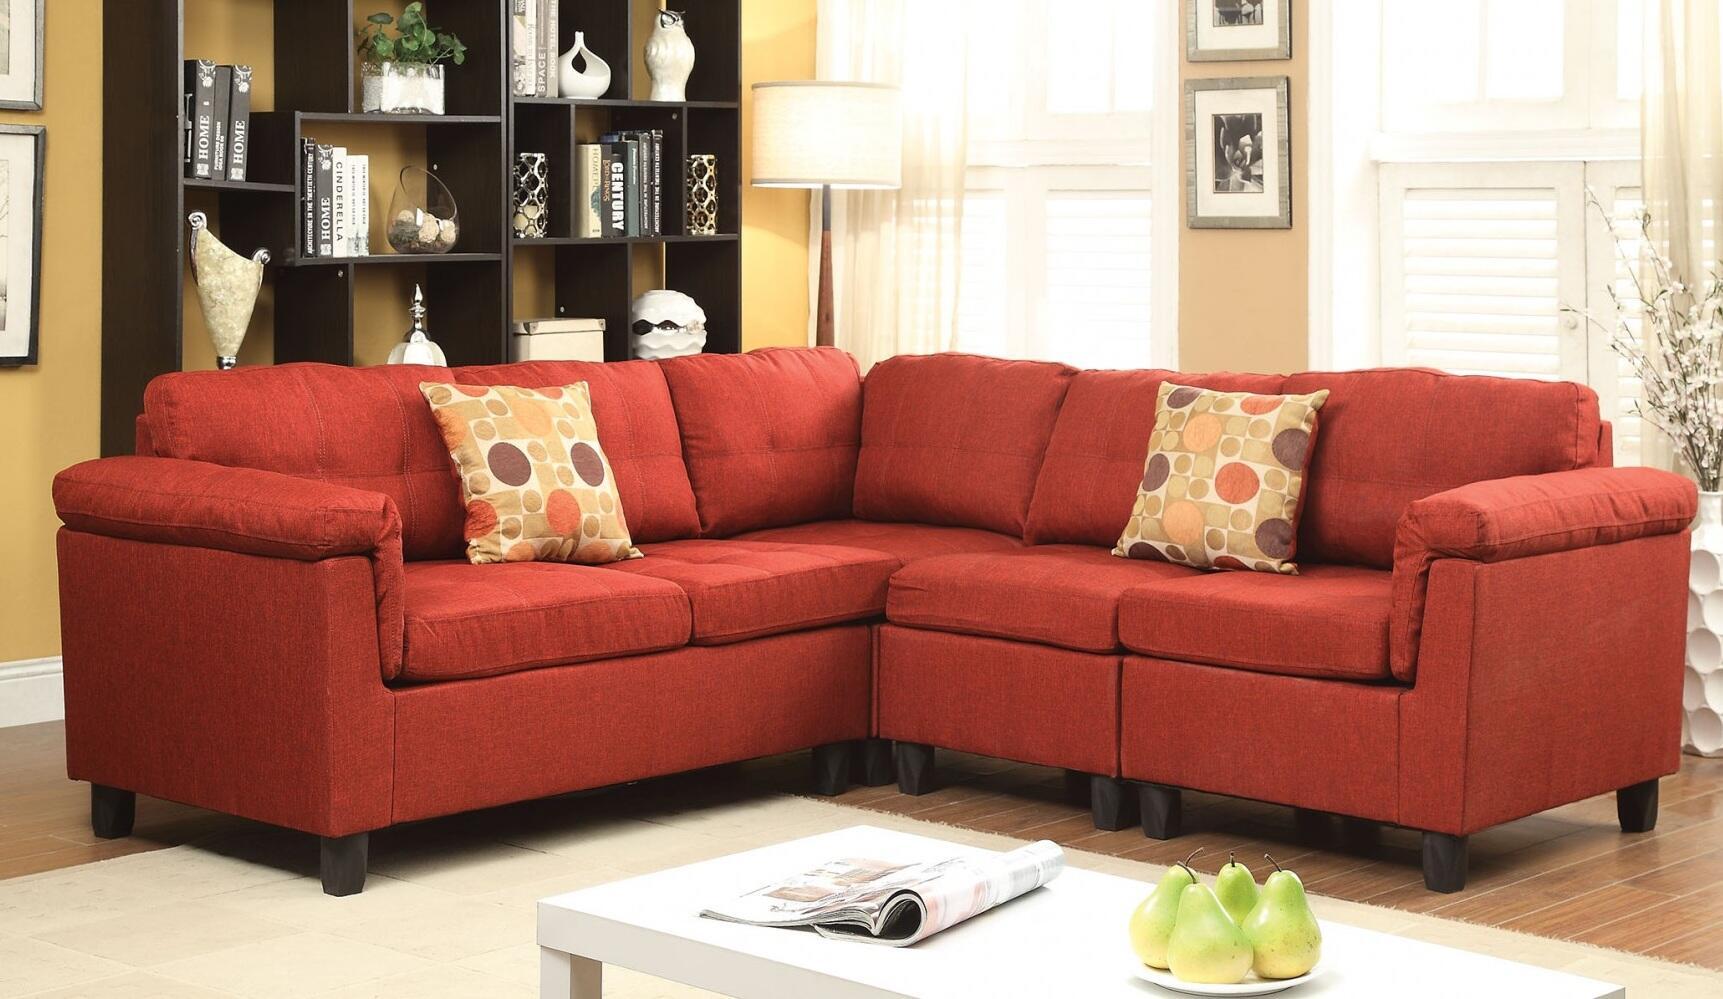 51545 Reversible Sectional Sofa